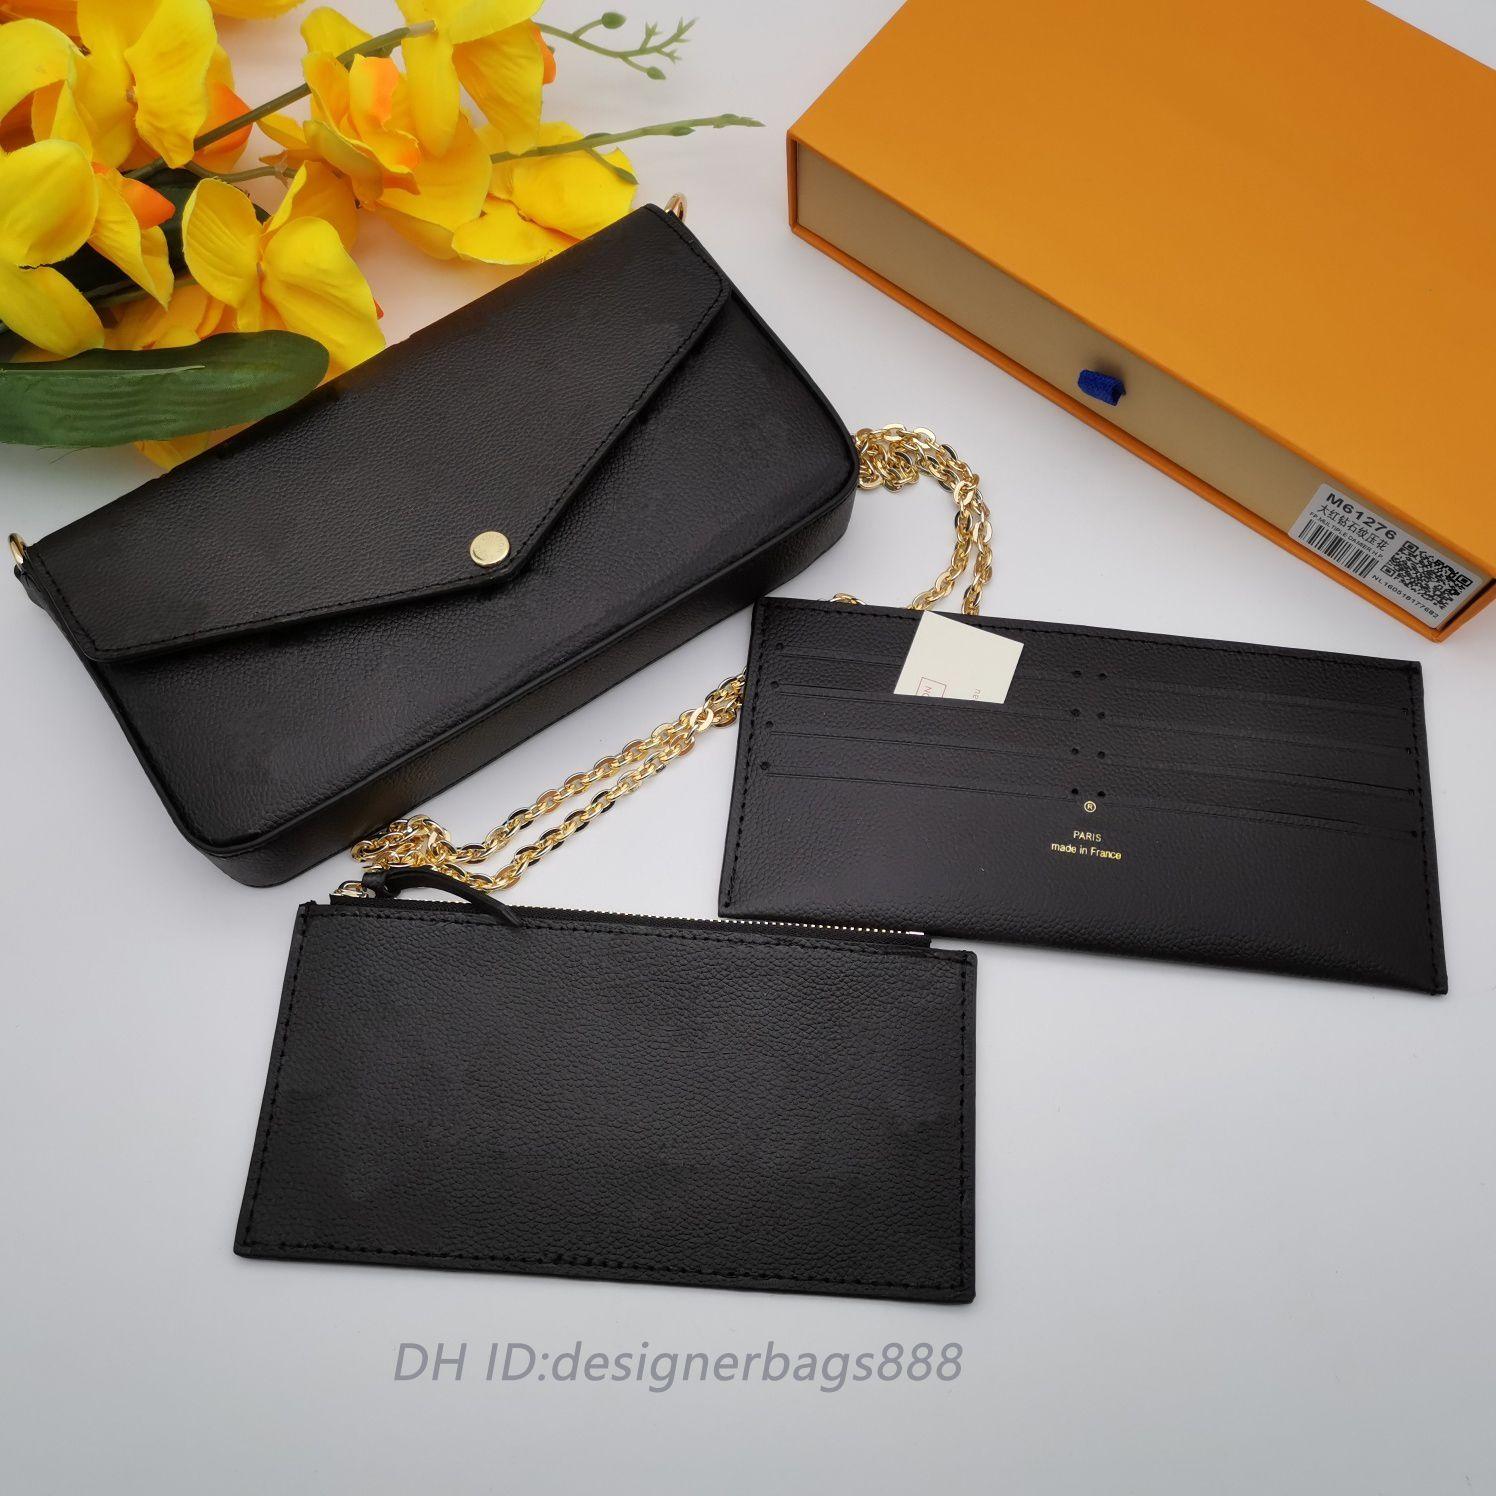 M61276 مع مربع pochette felicie النساء المصممين حقائب جلدية حقيقية المرأة محفظة مفتاح بطاقة المحفظة حقيبة رسول حقيبة الكتف crossbody محافظ اليد